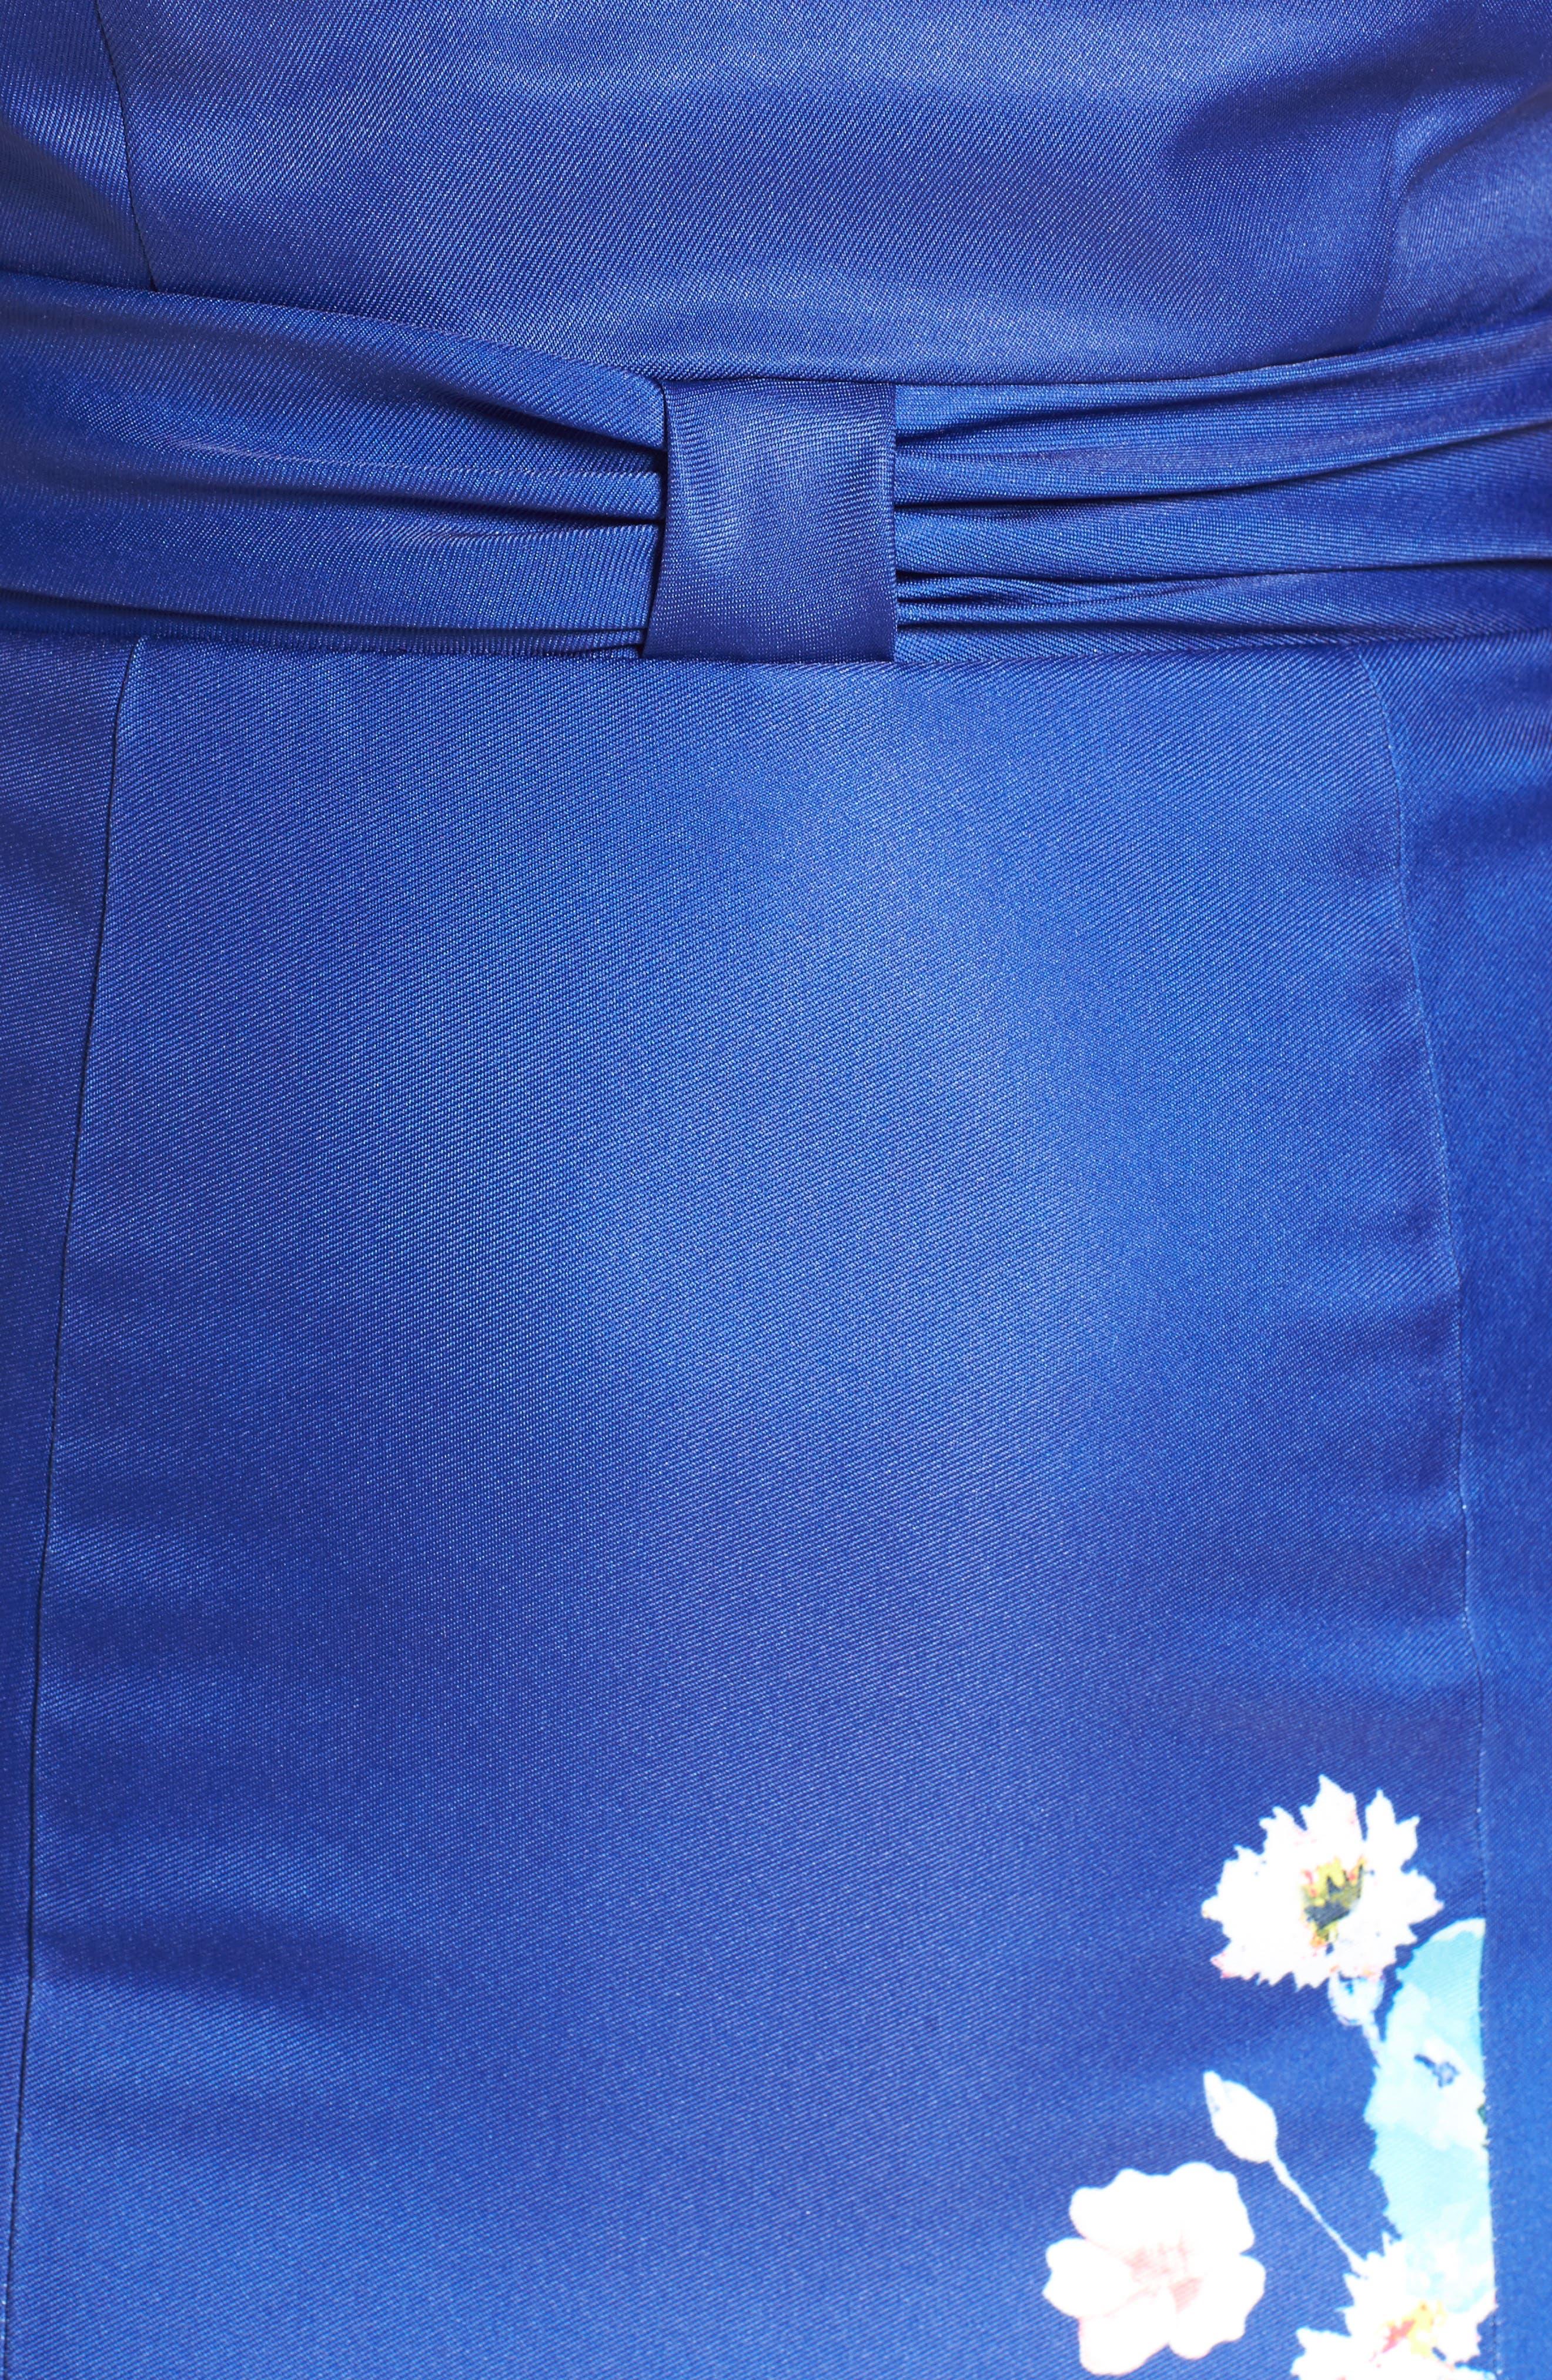 Floral A-Line Ballgown,                             Alternate thumbnail 5, color,                             400